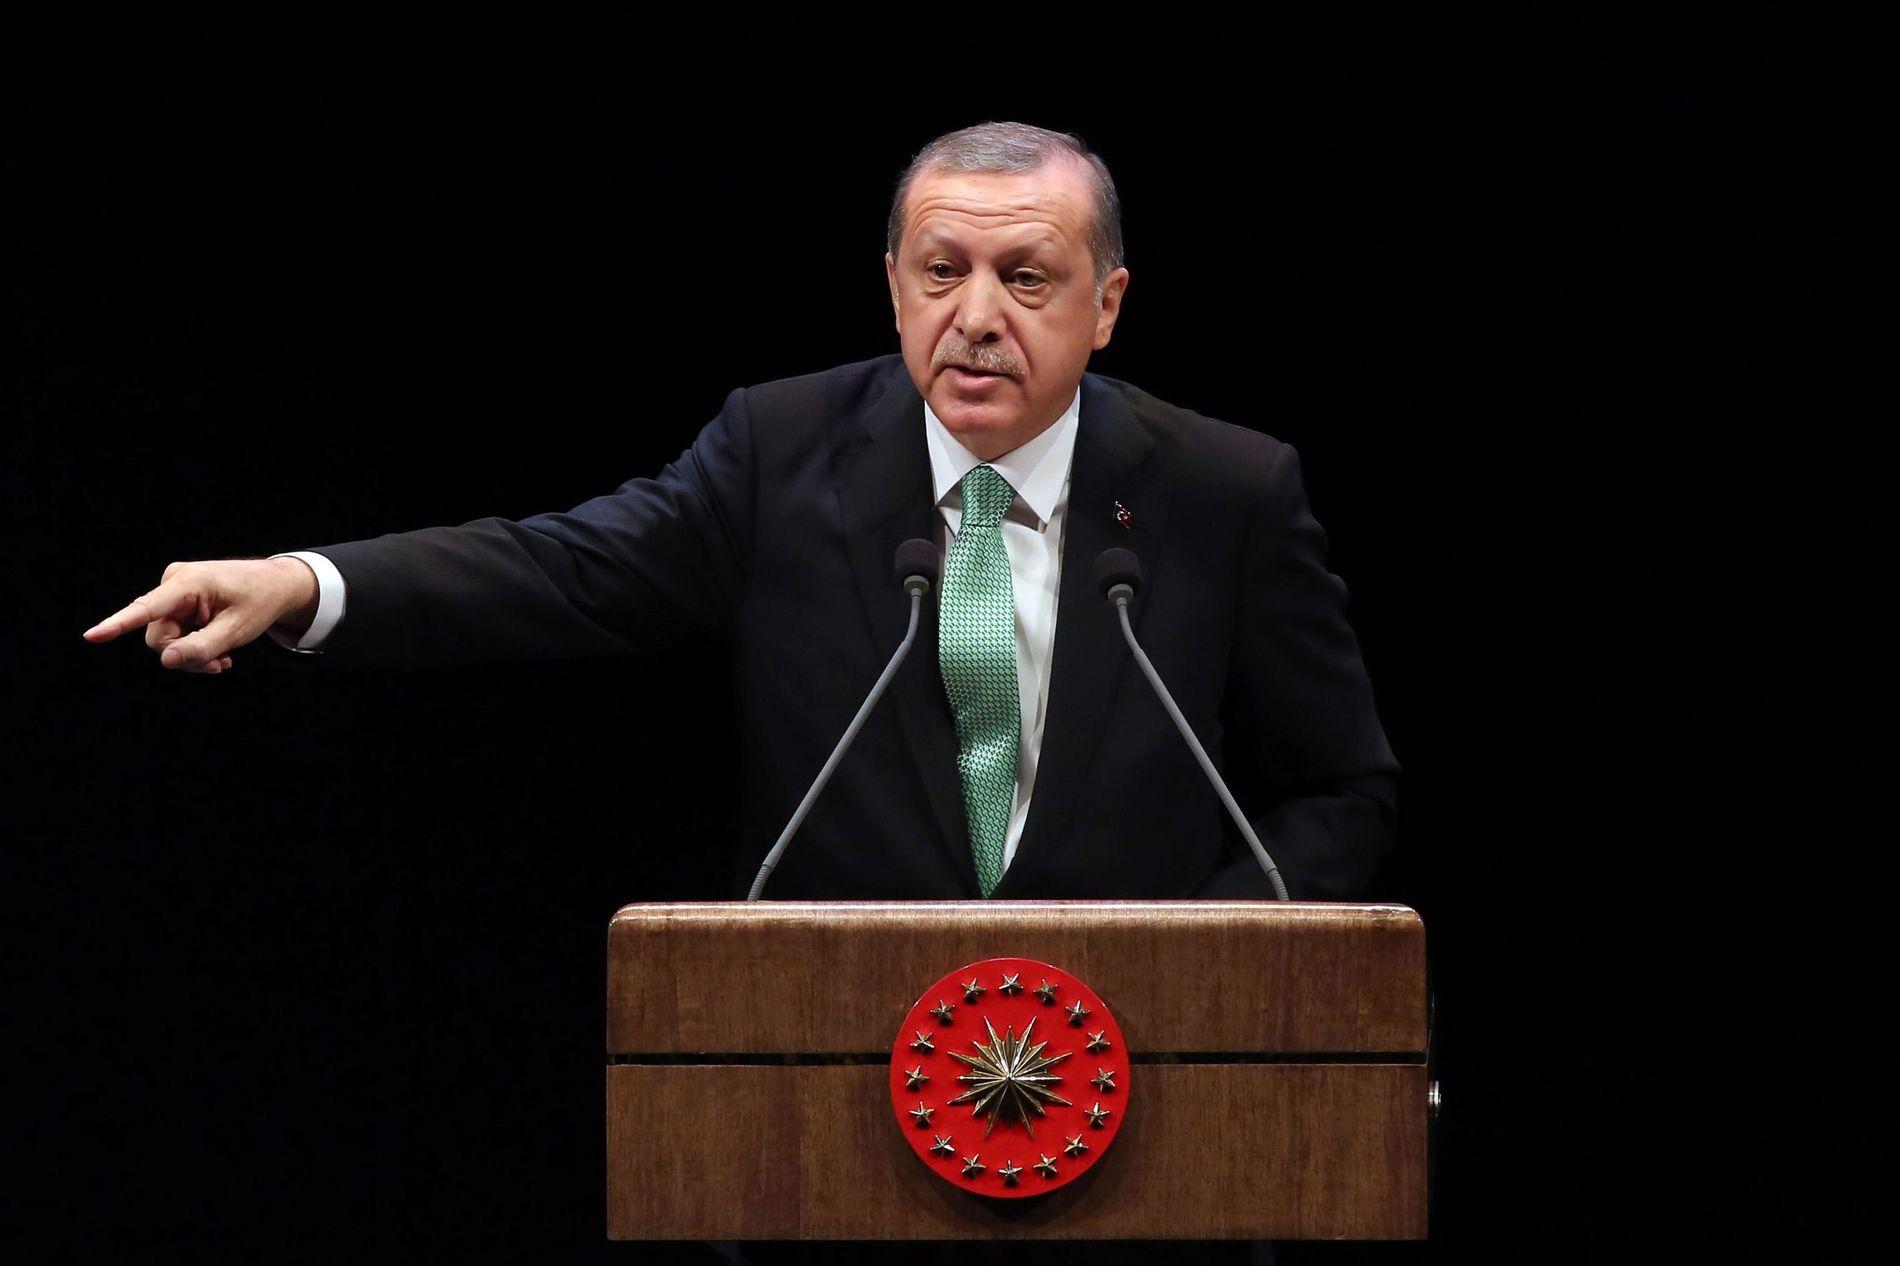 FÅR ALL MAKT: President Recep Tayyip Erdogan får formelt den utøvende makten i Tyrkia dersom grunnlovsendringen vedtas.